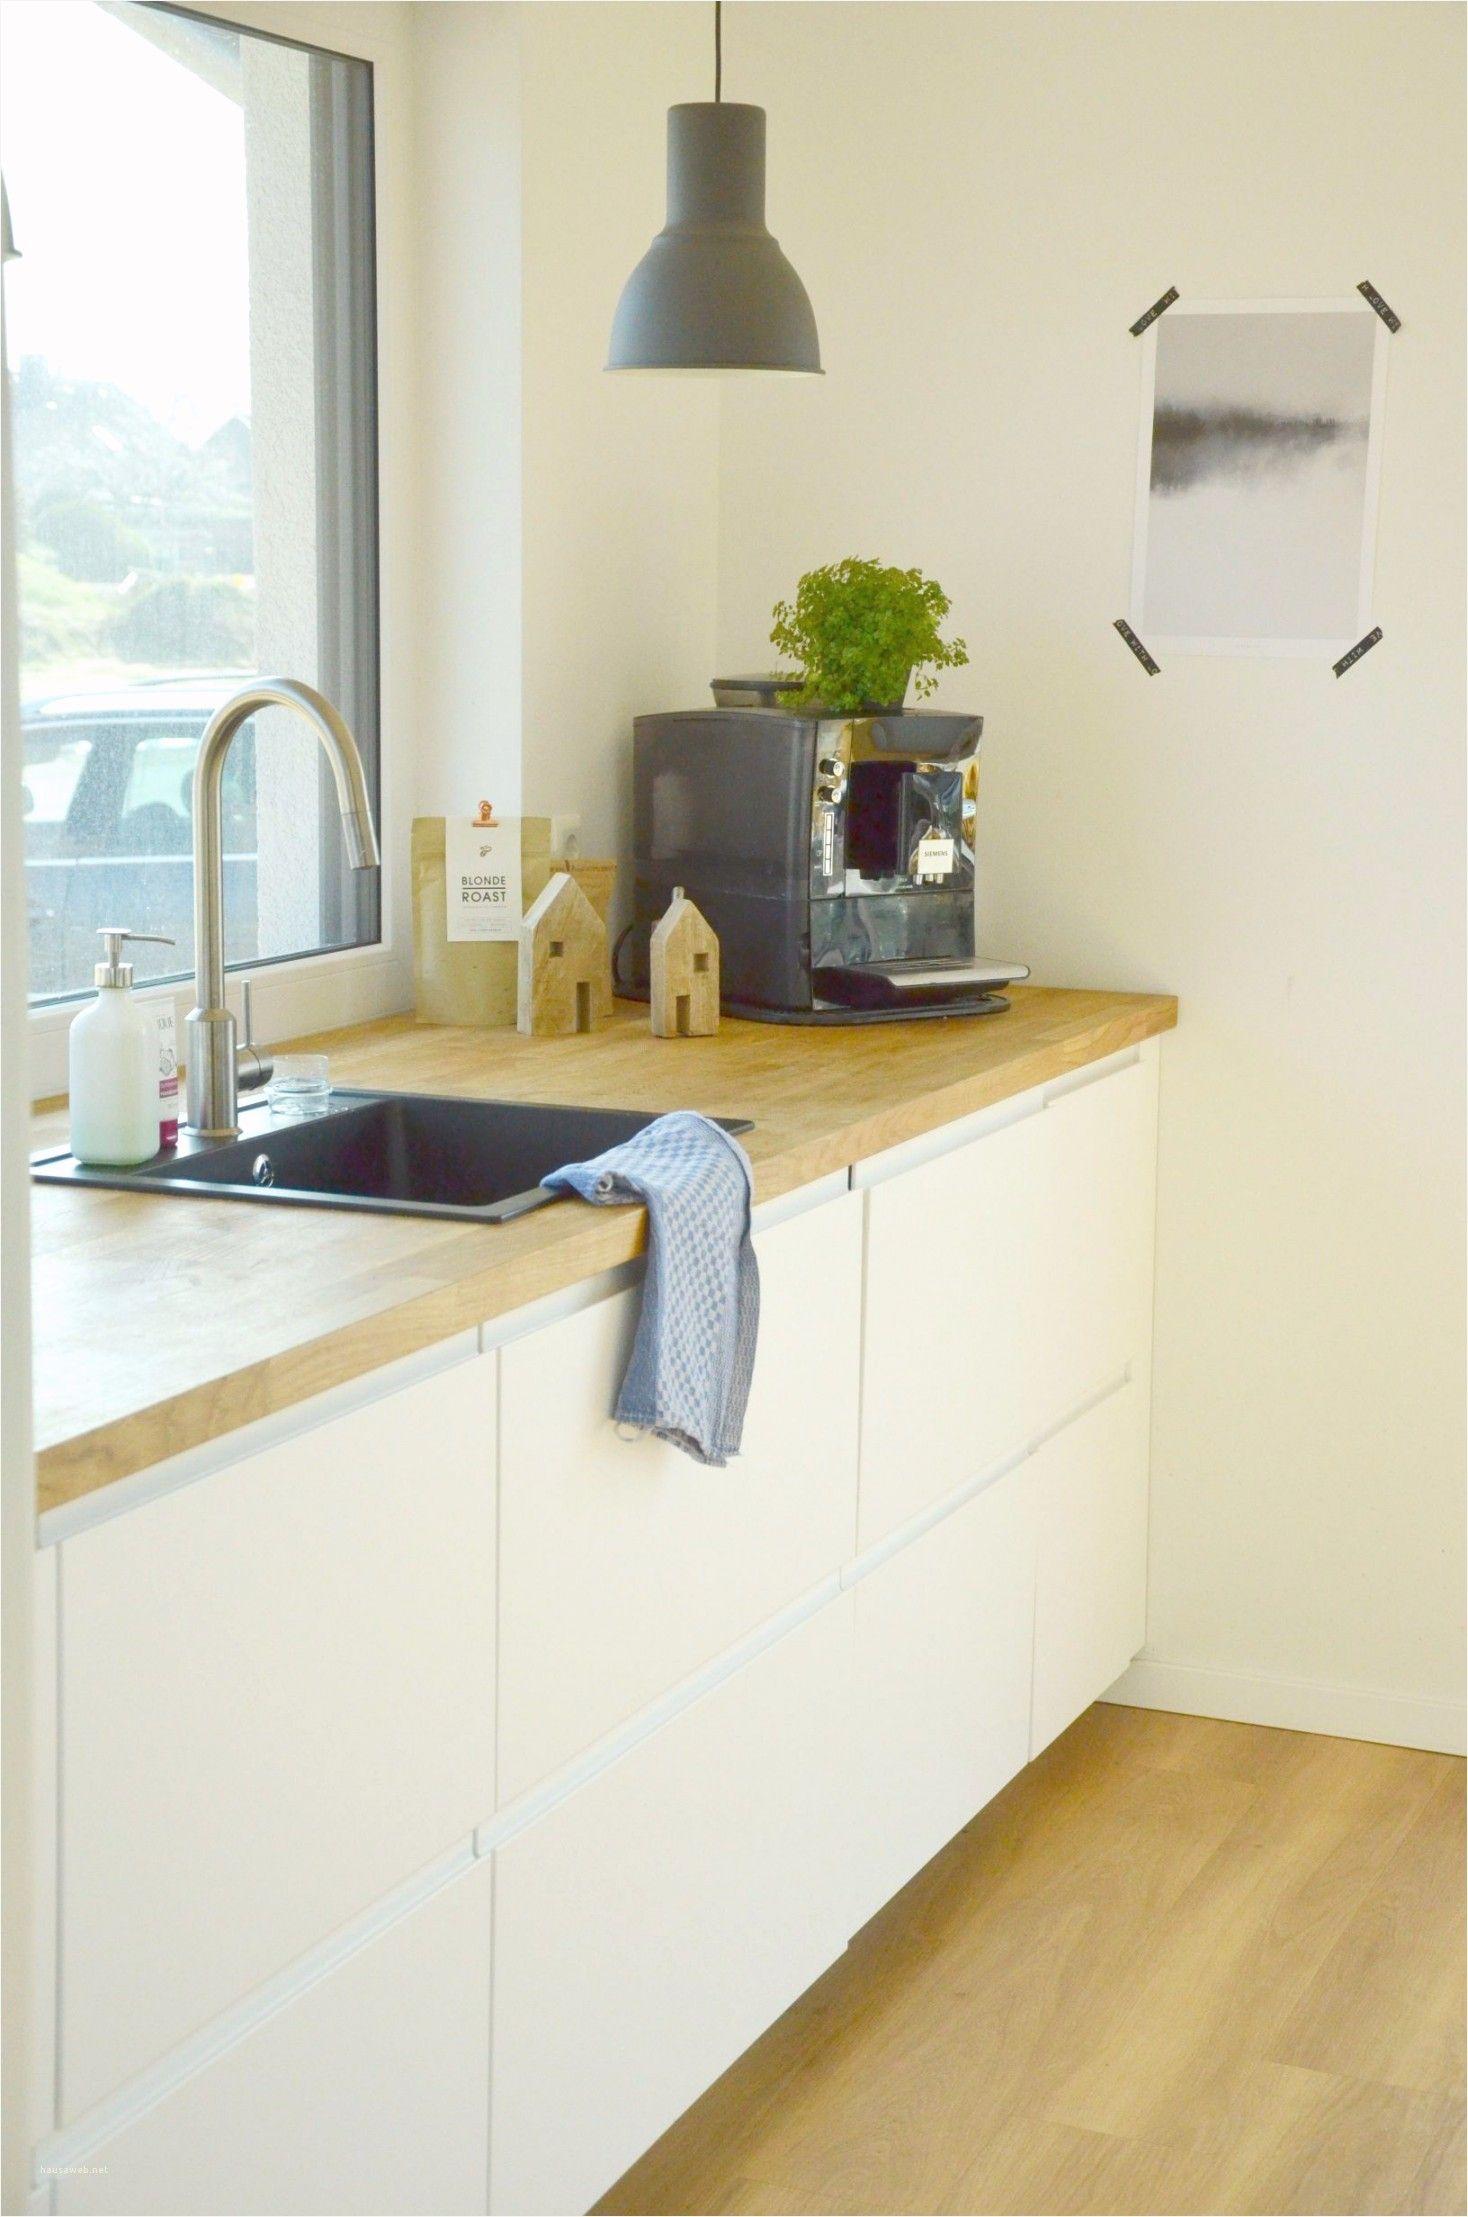 Personlig Arbeitsplatte Inspirierend Appealing Meine Kueche Von Ikea Voxtorp Personlig Piepenkoetters Keuken In Woonkamer Keuken Idee Keuken Ideeen Modern